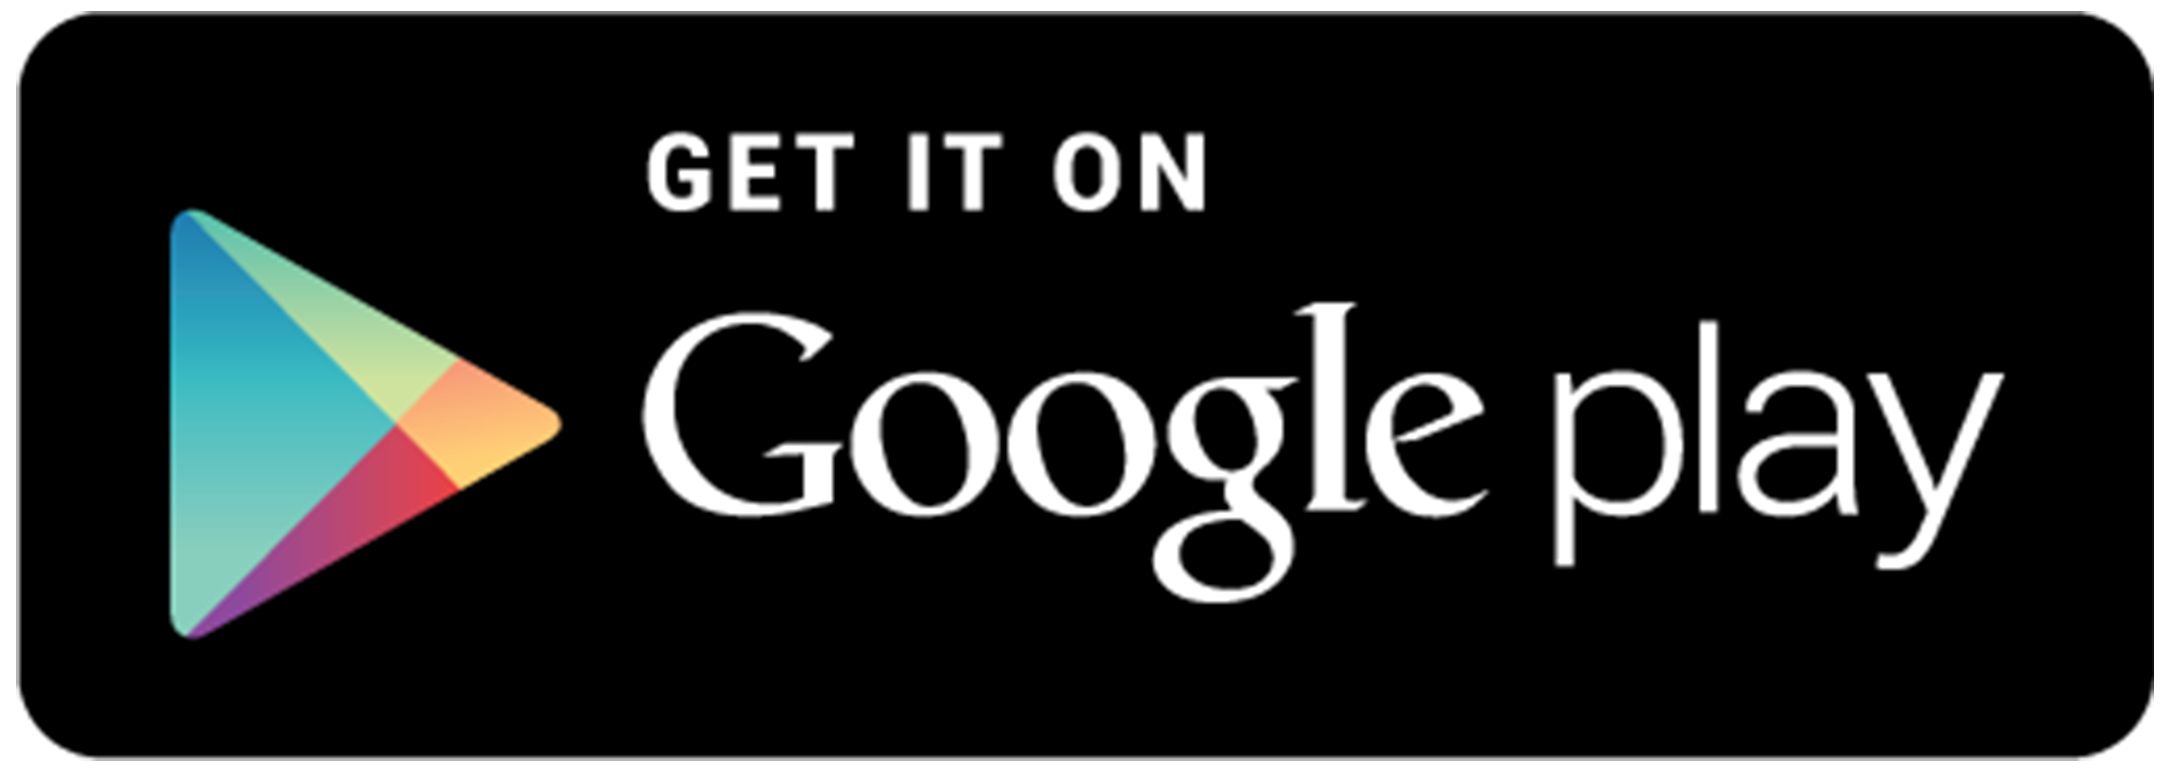 google play itunes png logo